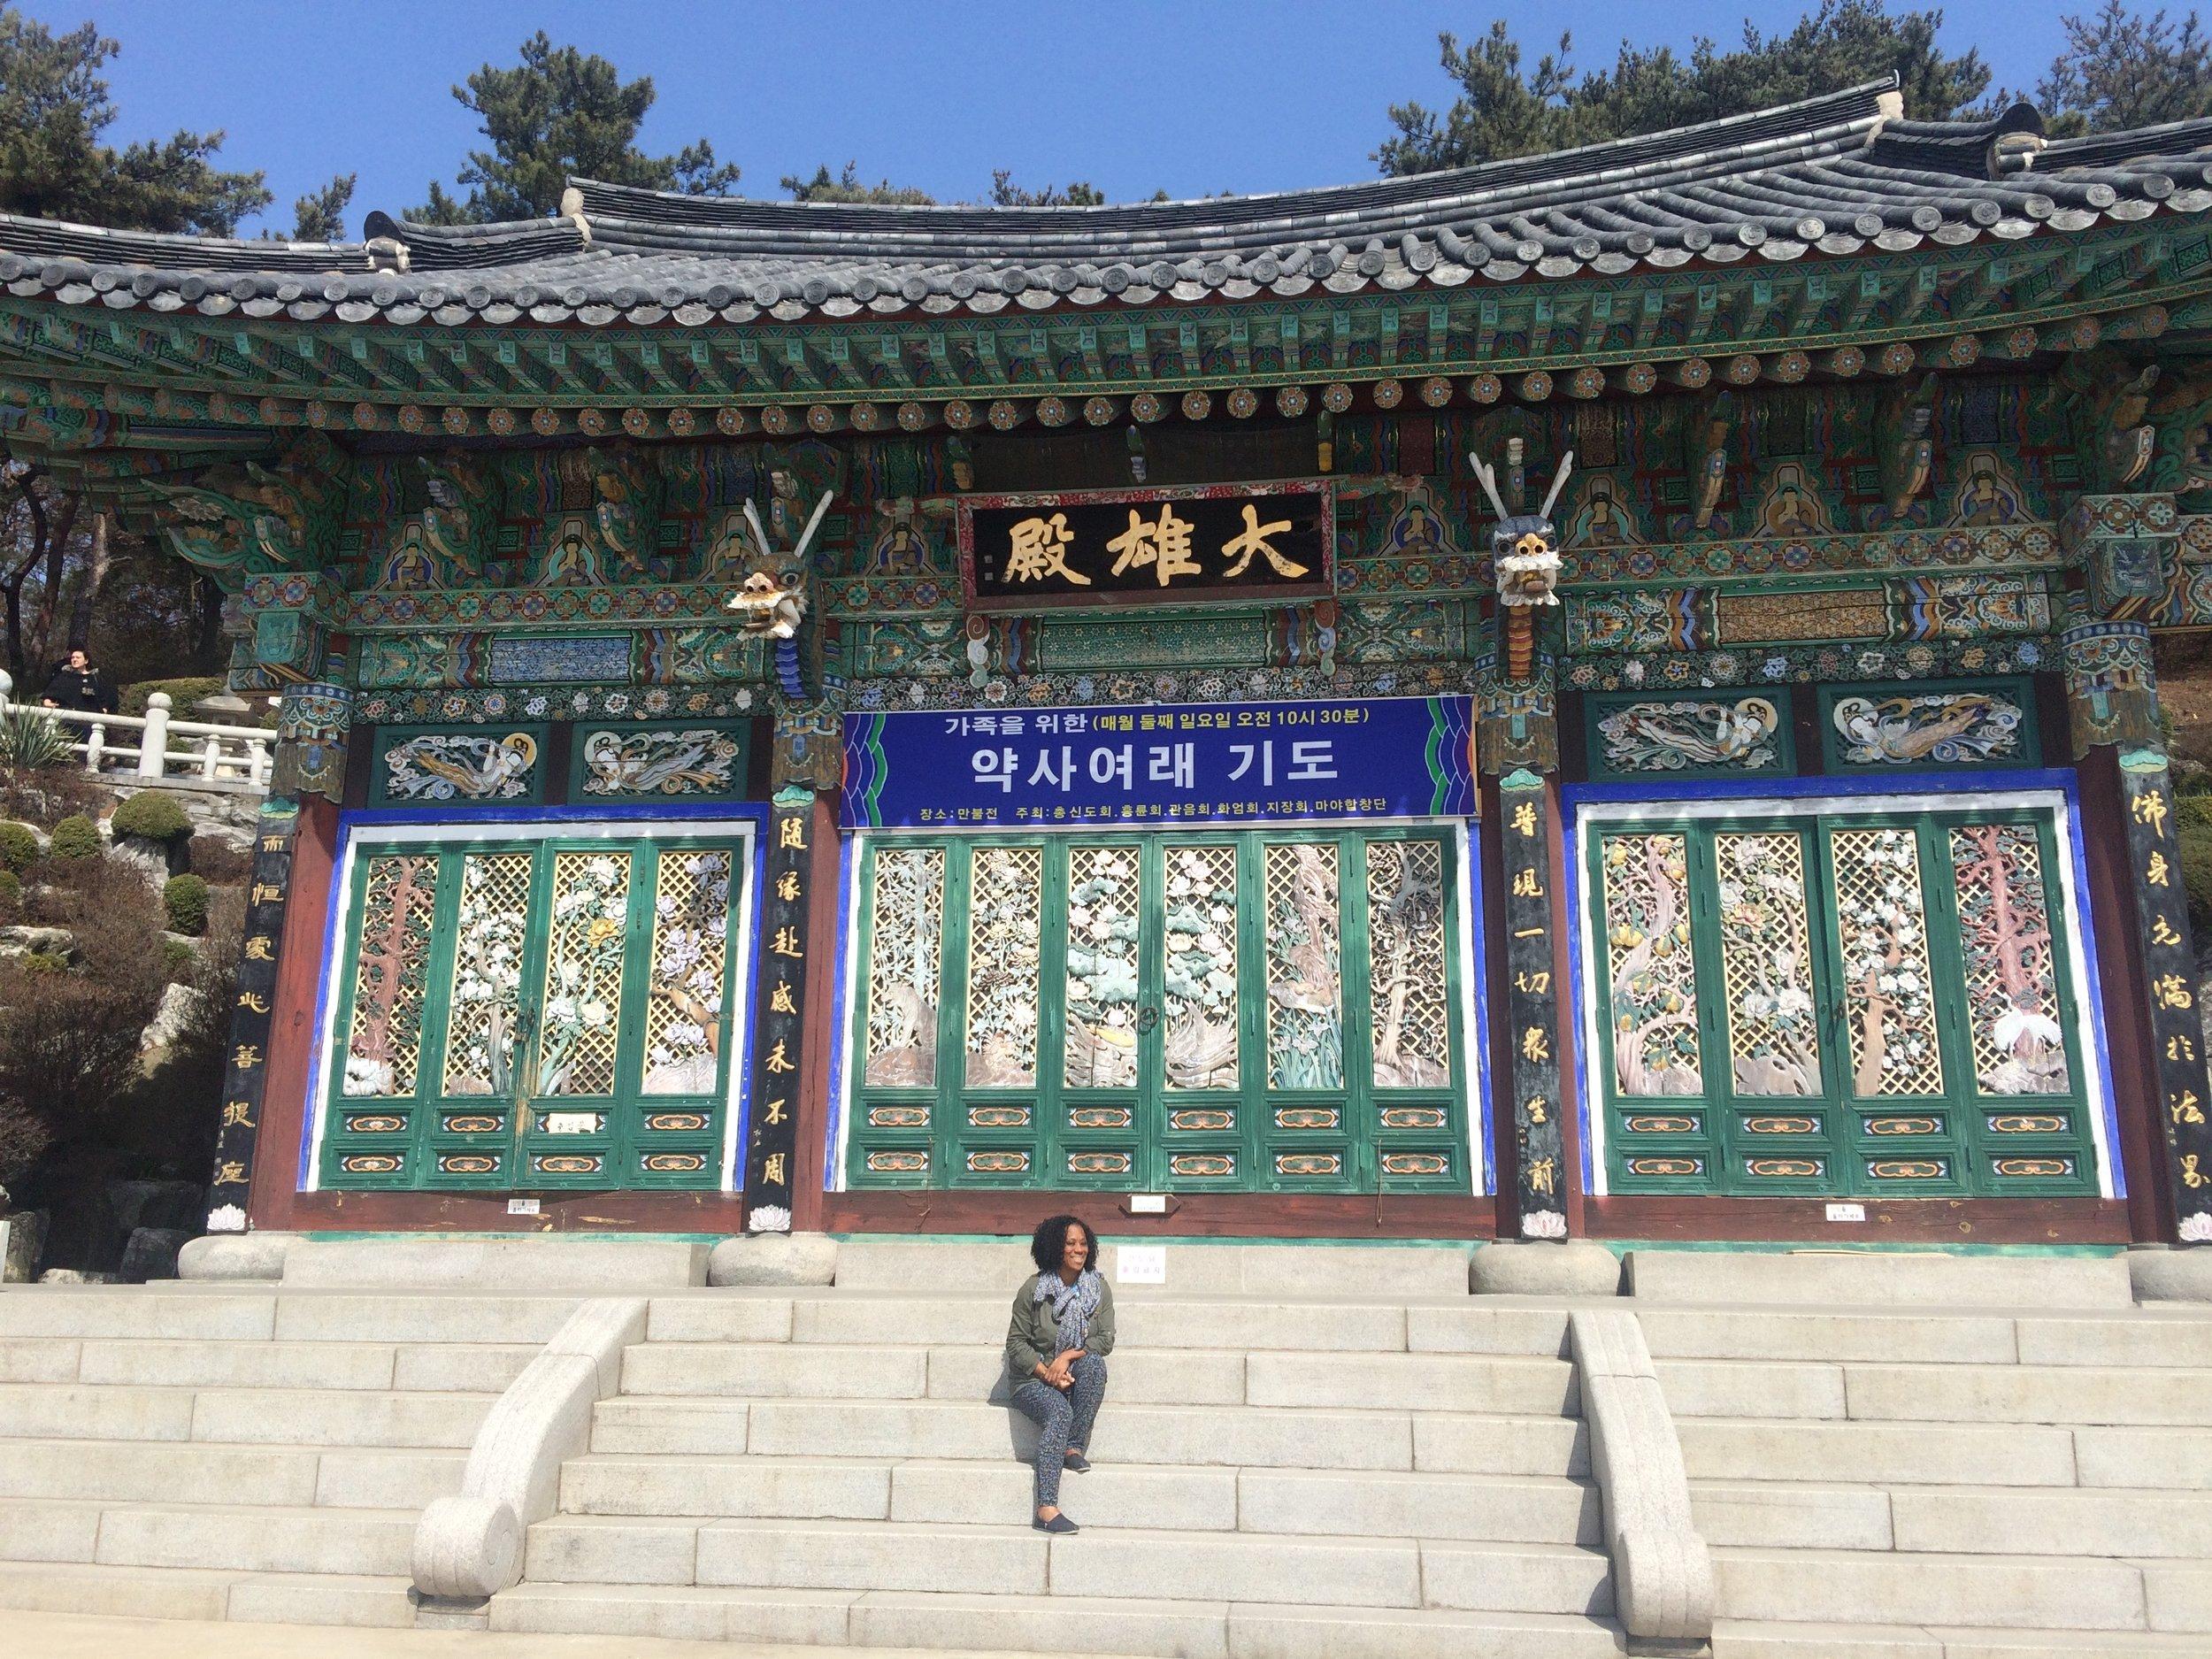 Dayka Robinson Bali Black Woman Solo International Black Woman Travel Ubud Incheon Seoul Korea-2 2016.jpg